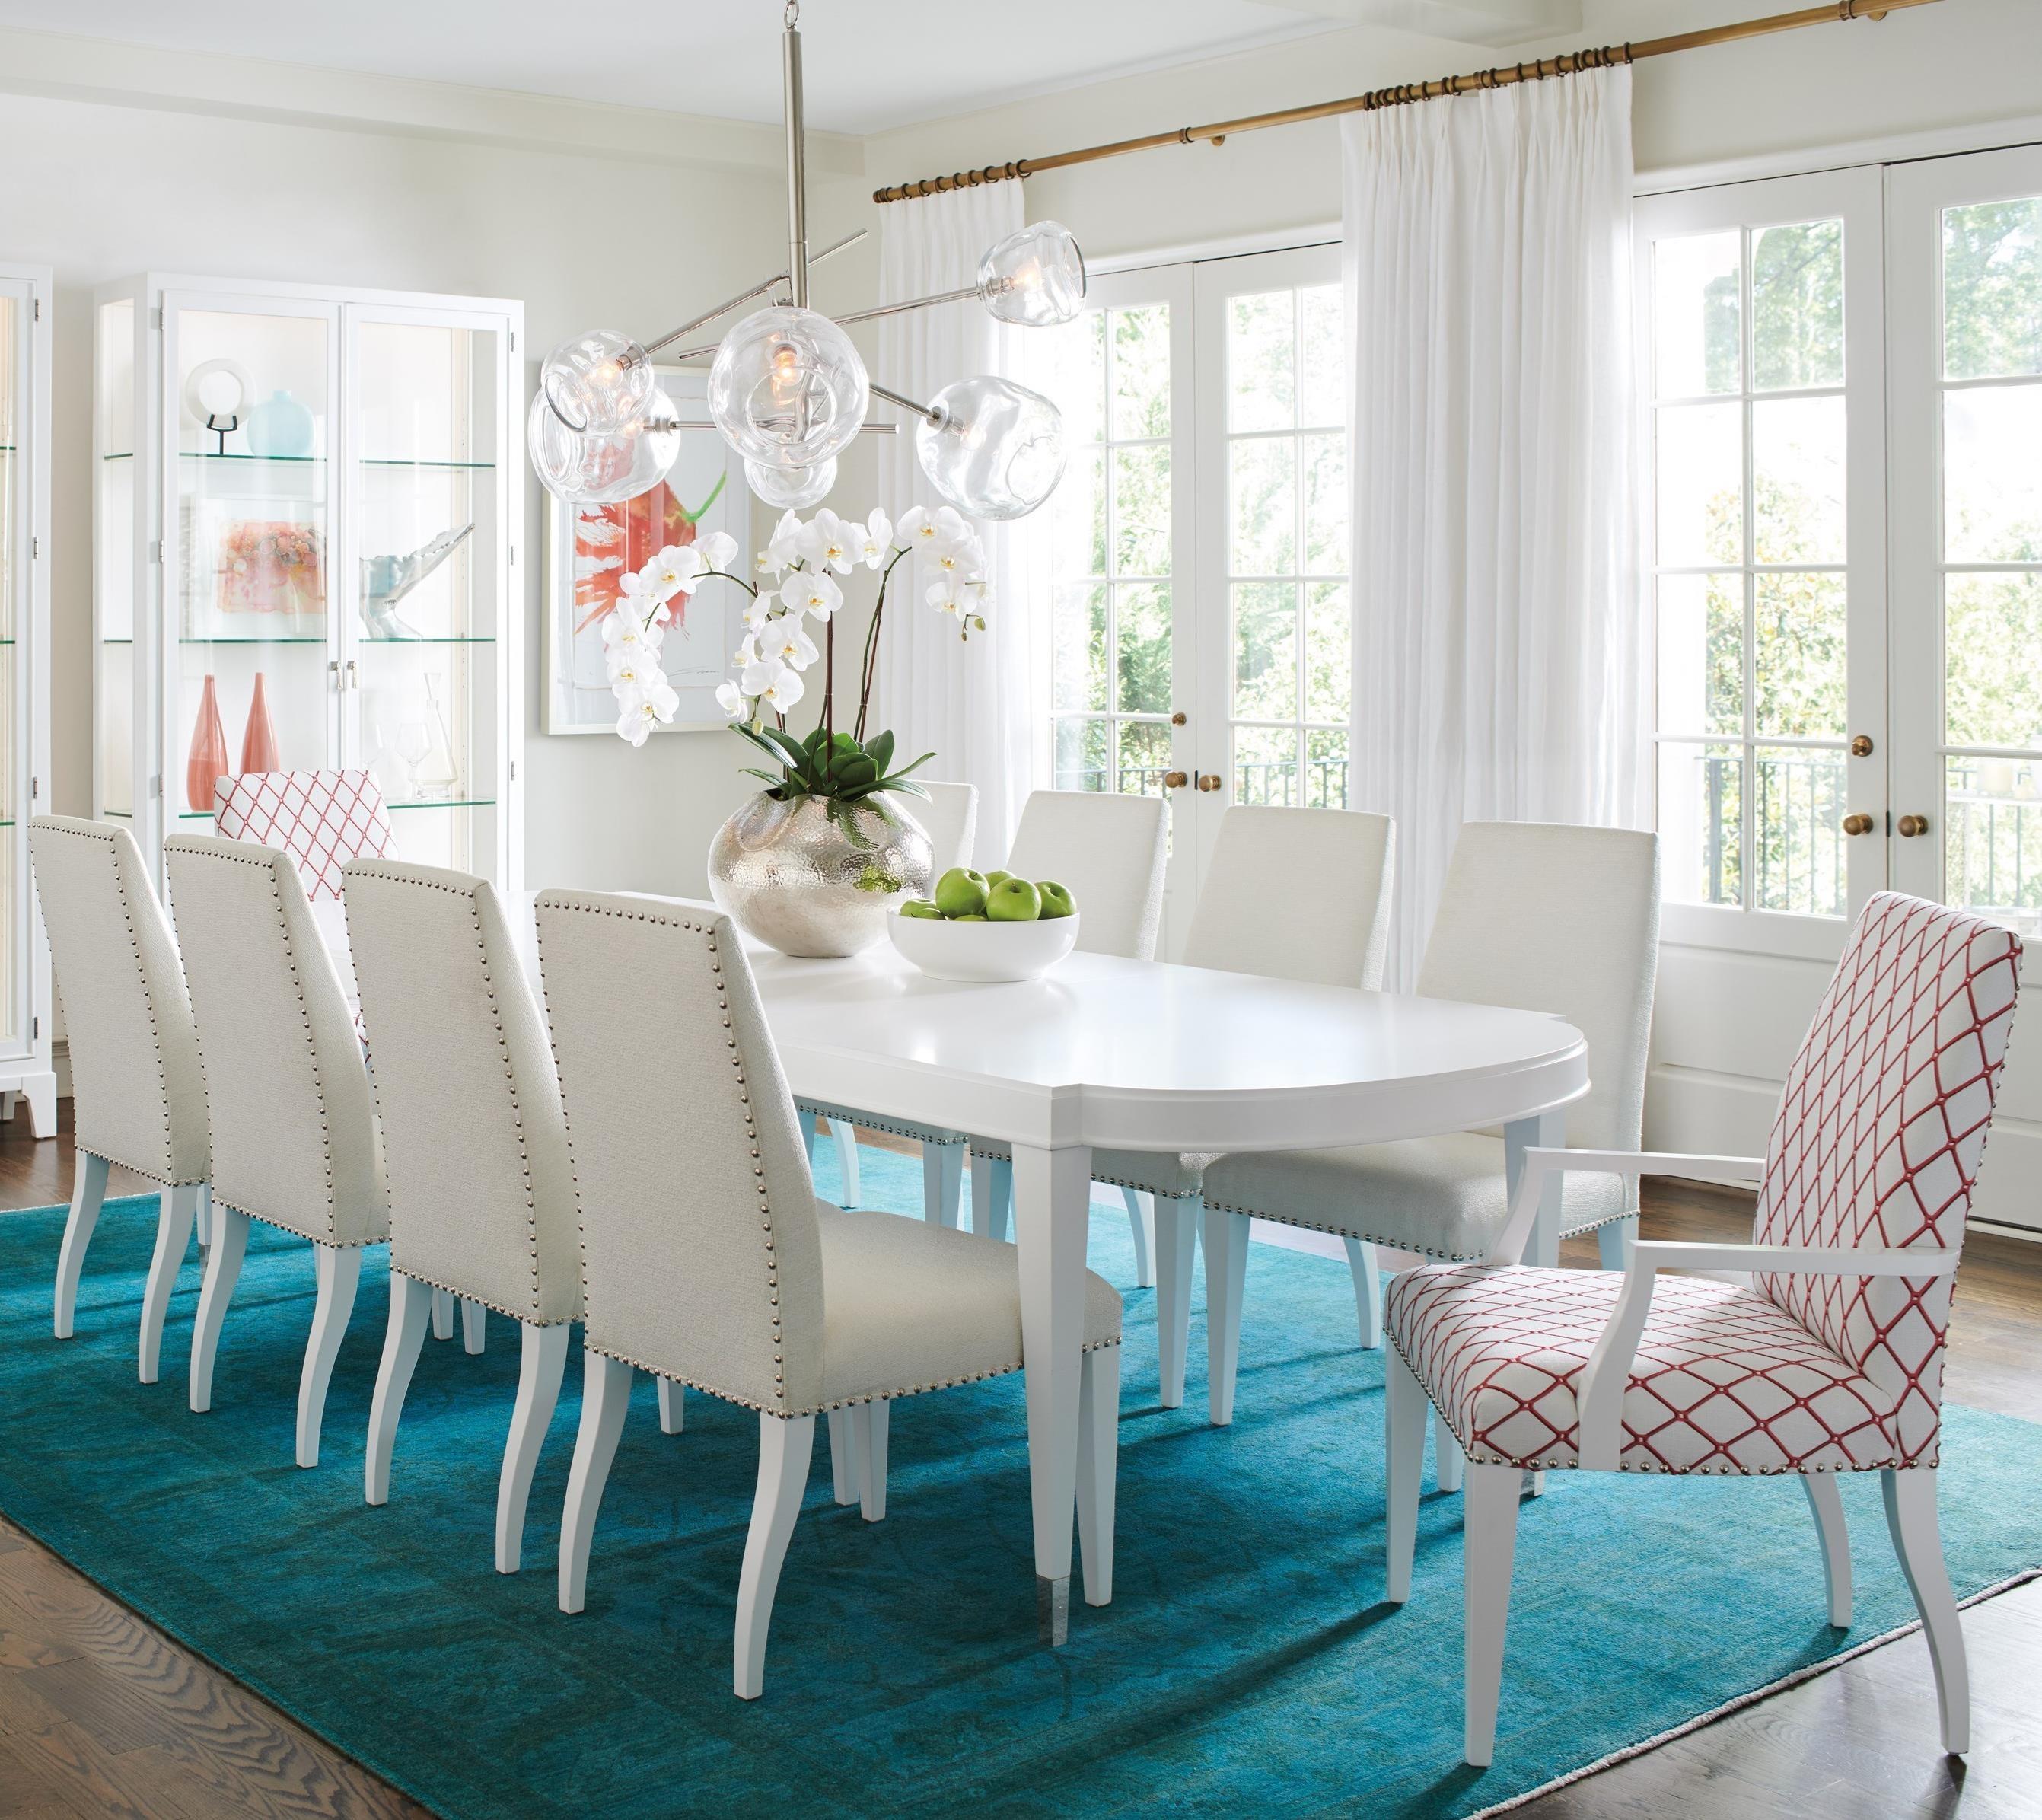 Avondale 11 Piece Dining Set by Lexington at Baer's Furniture